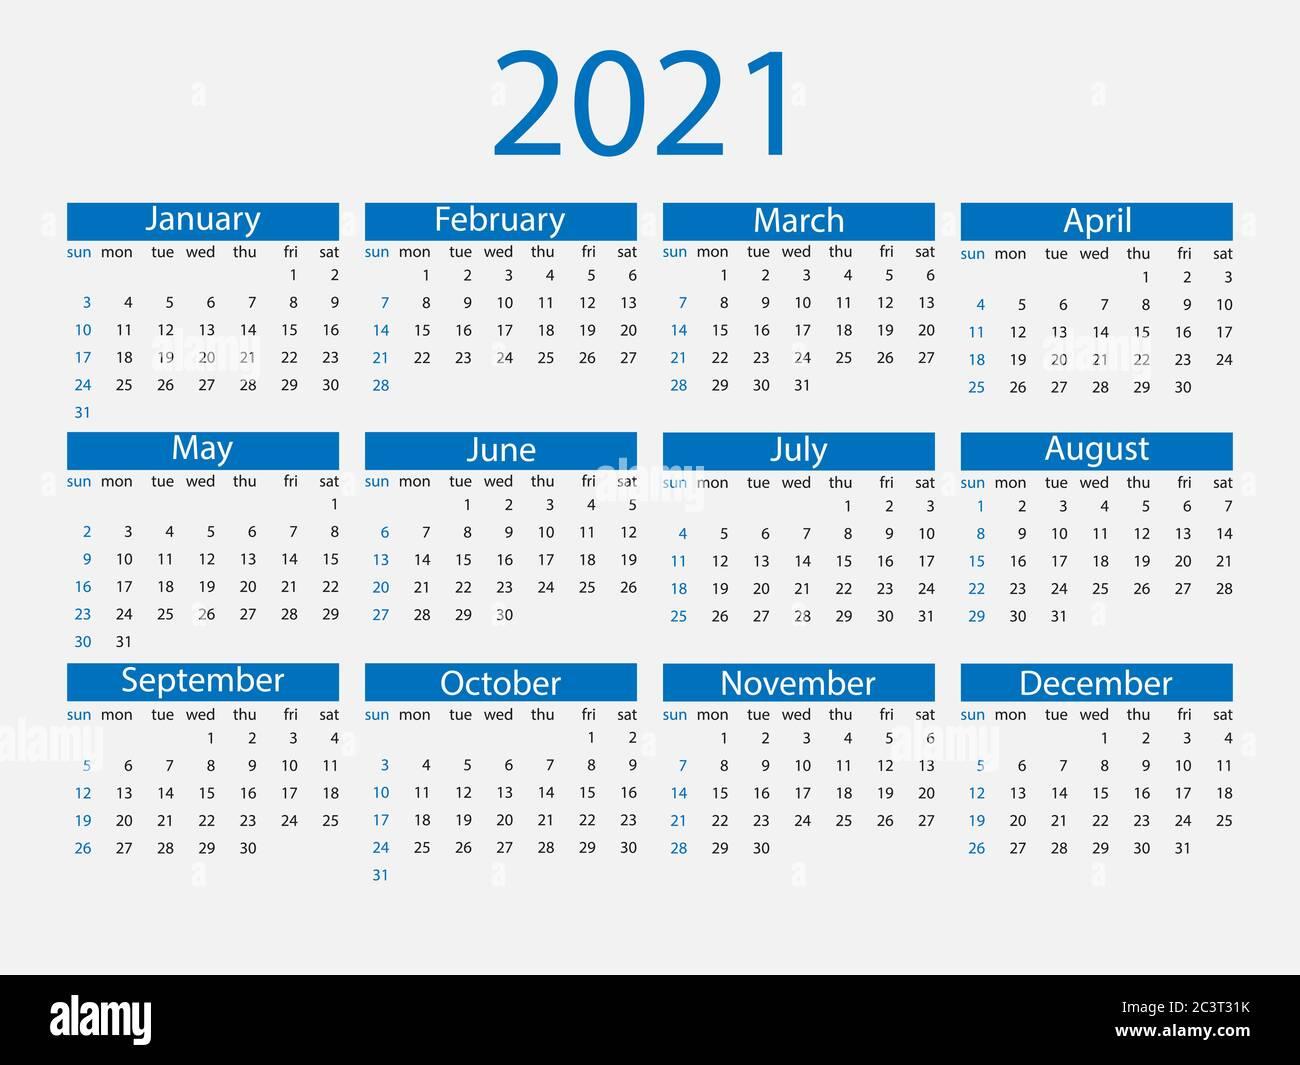 Calendar Weeks 2021 2021 calendar, week starts Sunday. Vector illustration, flat